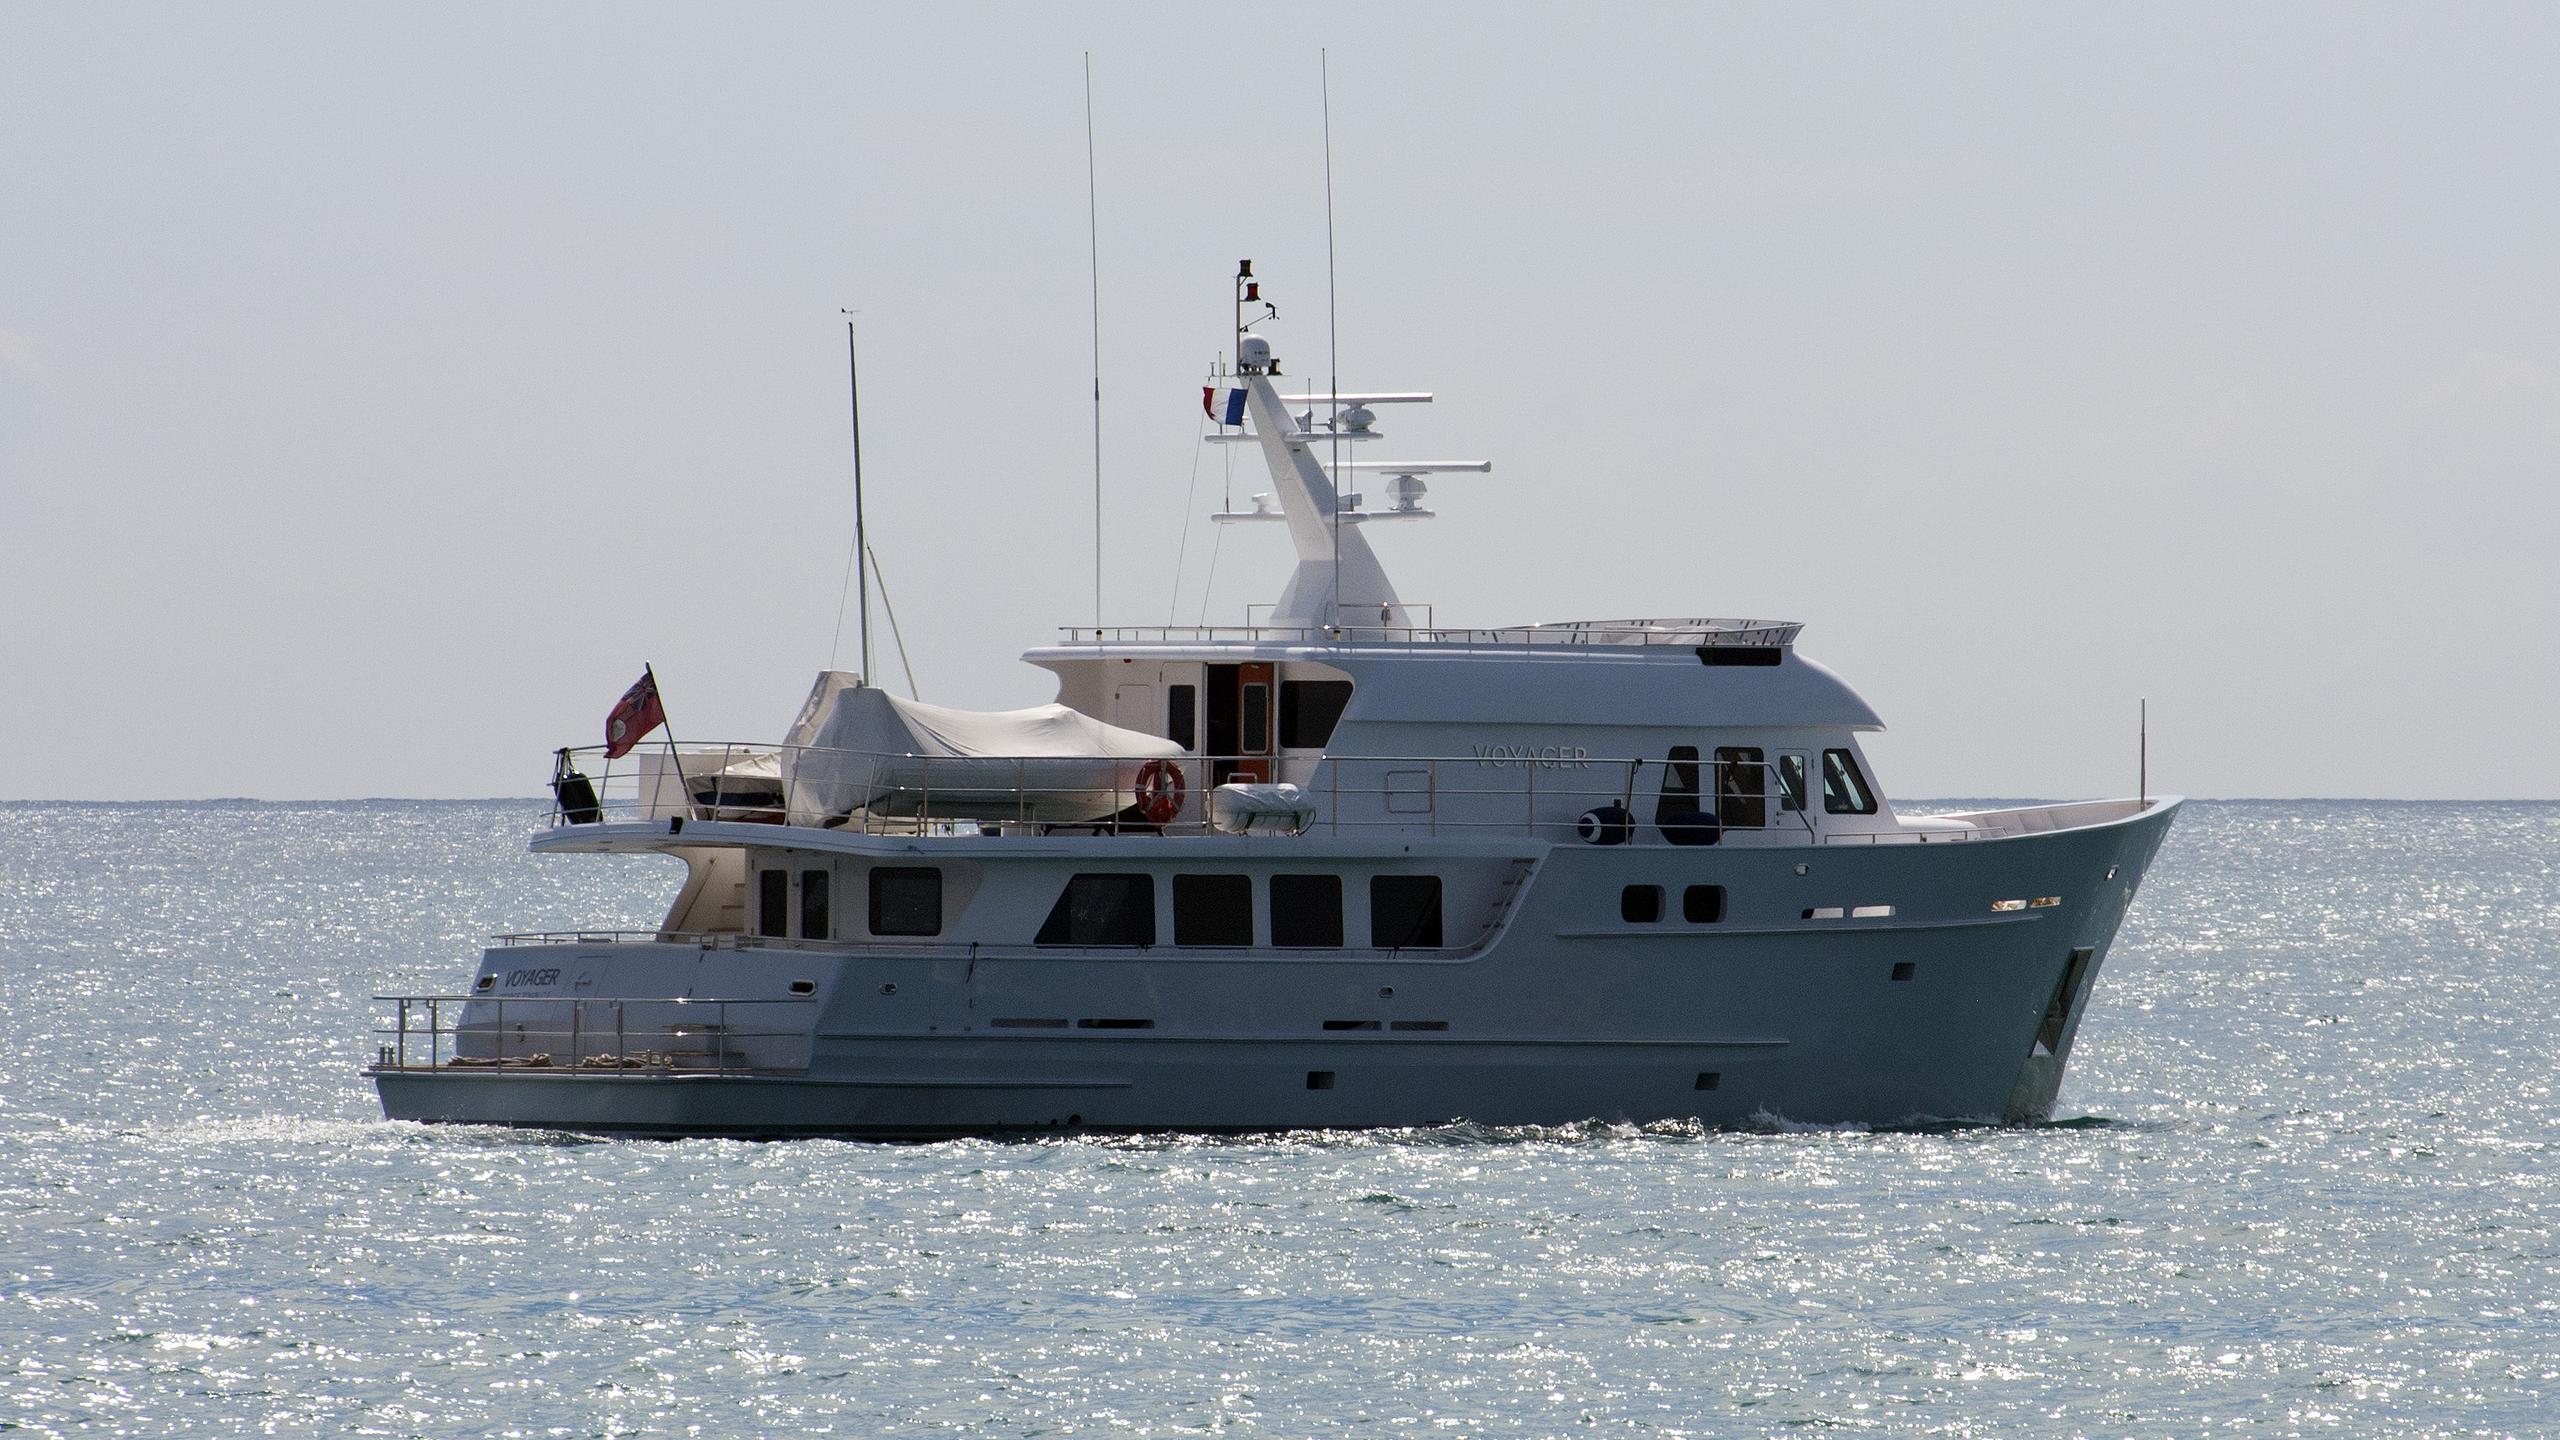 voyager-explorer-yacht-custom-passage-maker-85-2004-26m-profile